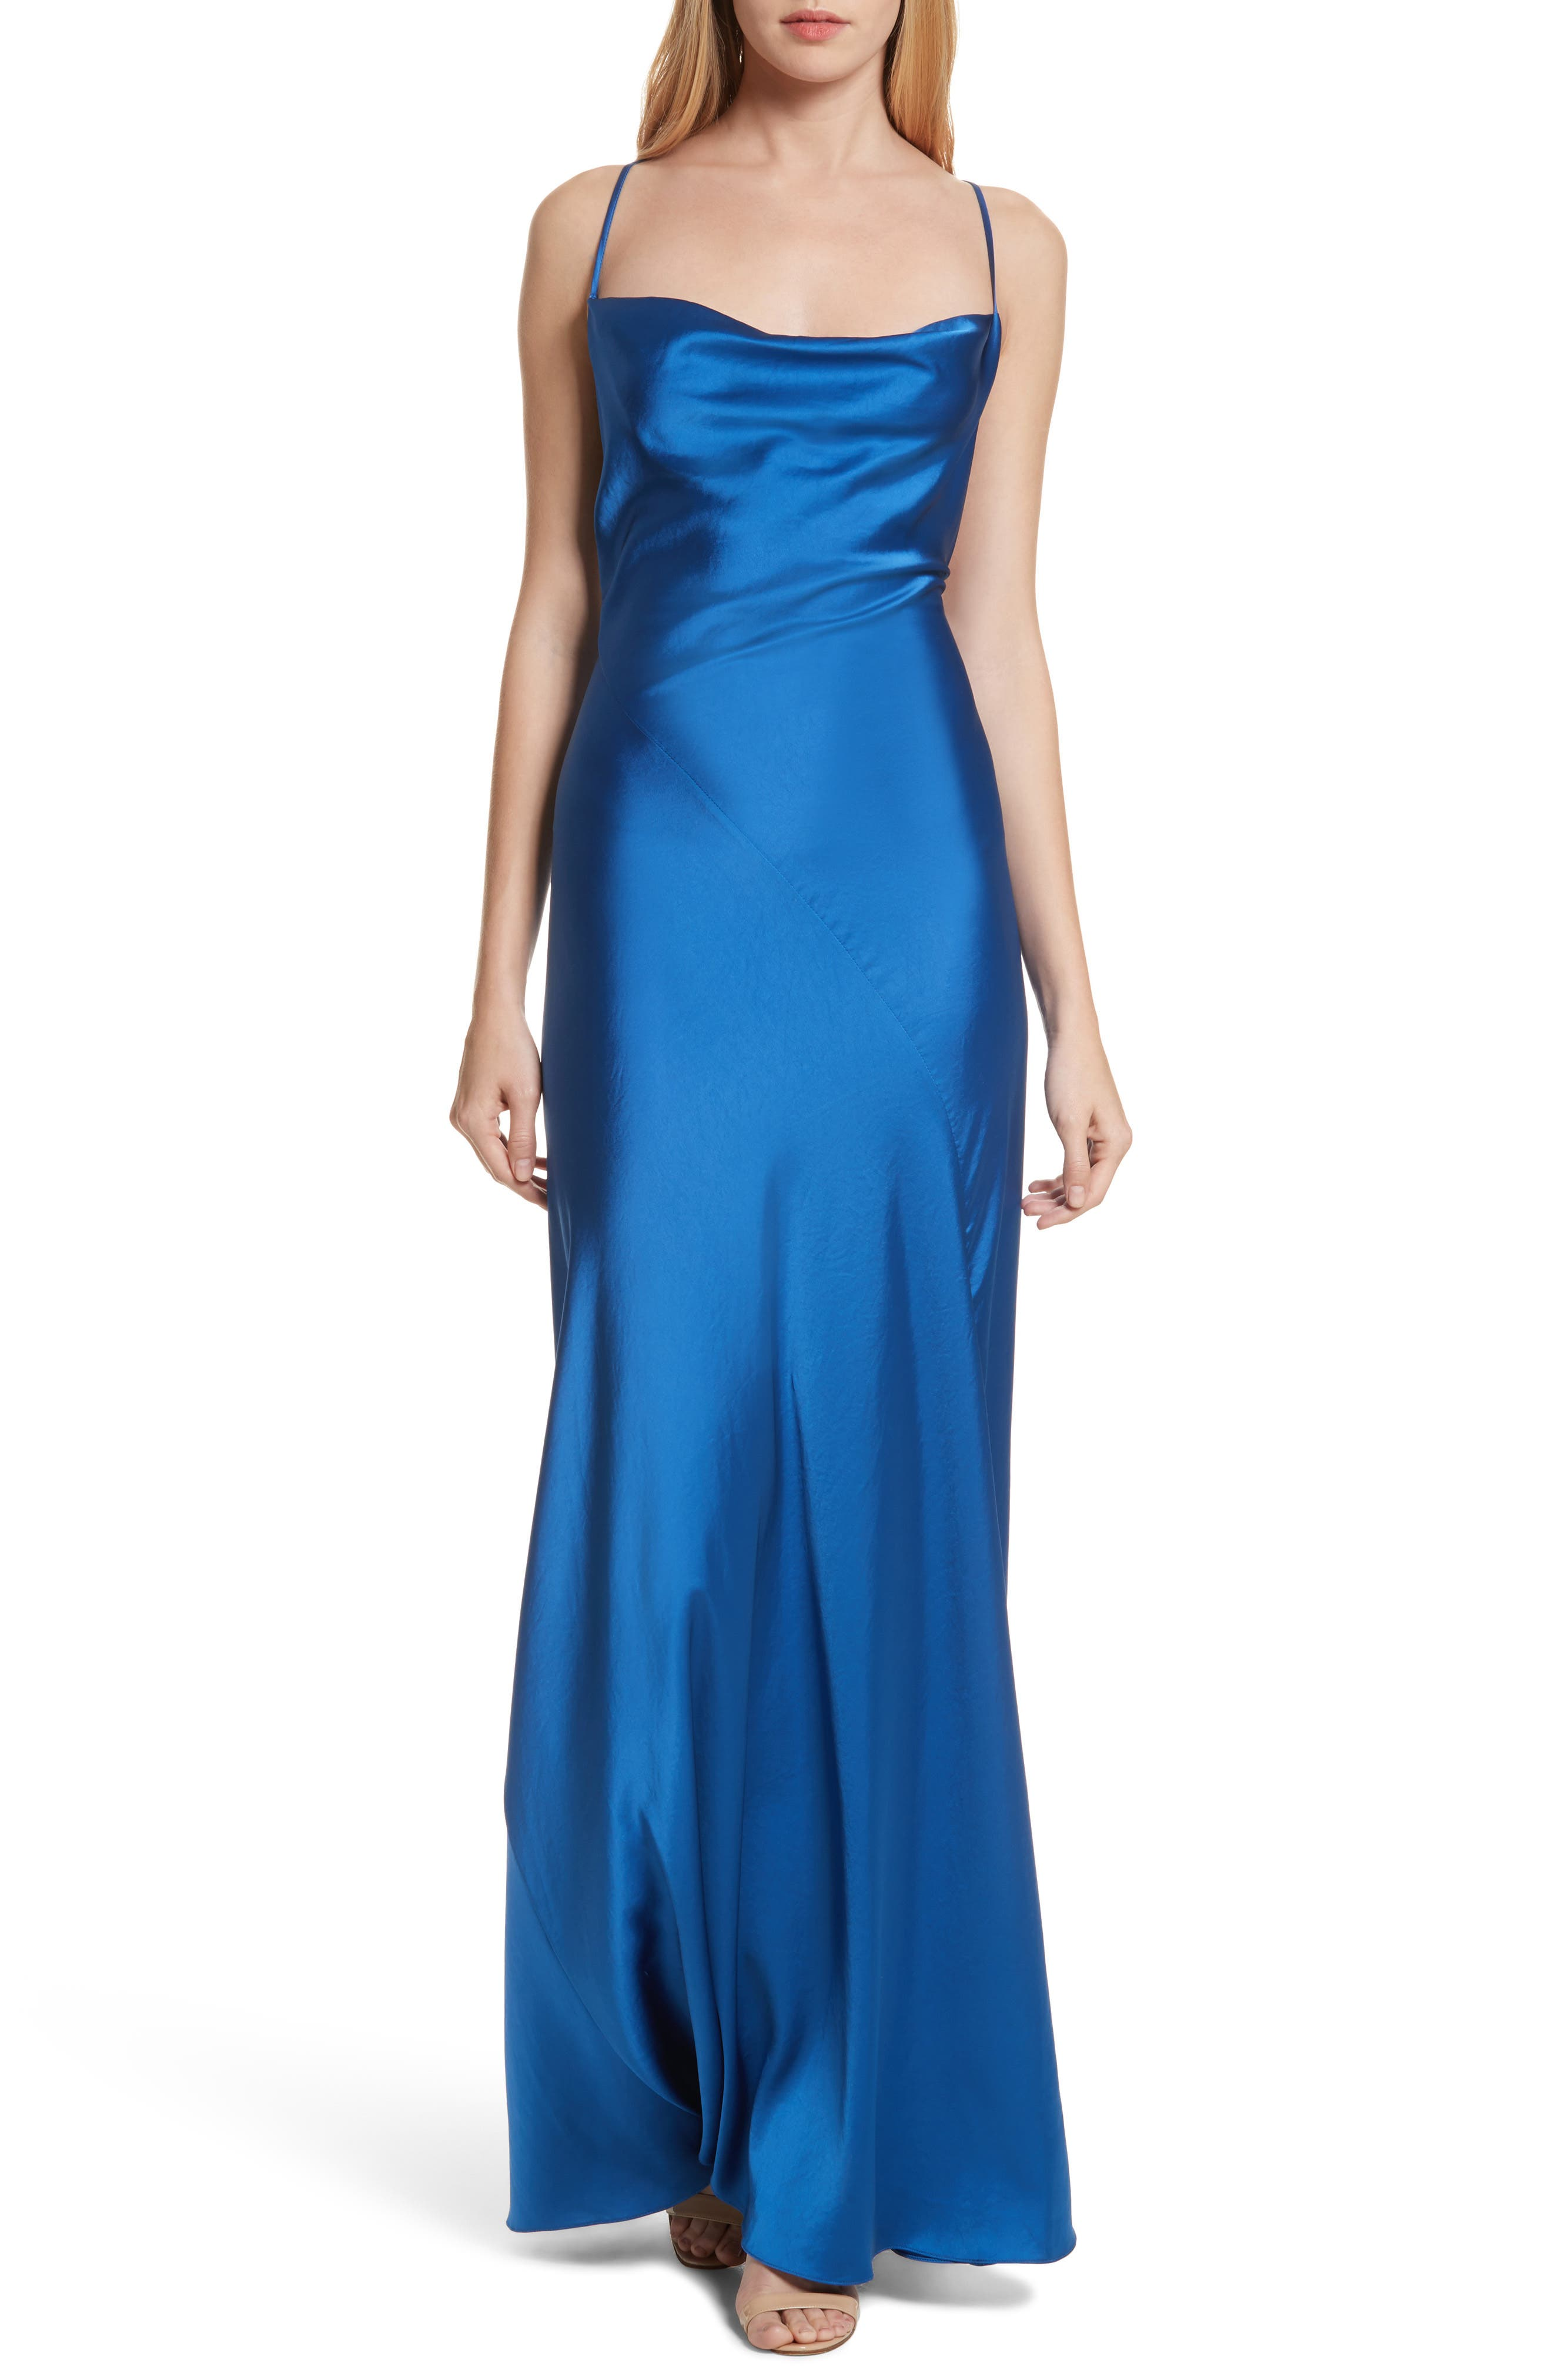 Diane von Furstenberg Open Back A-Line Gown,                         Main,                         color, Cove